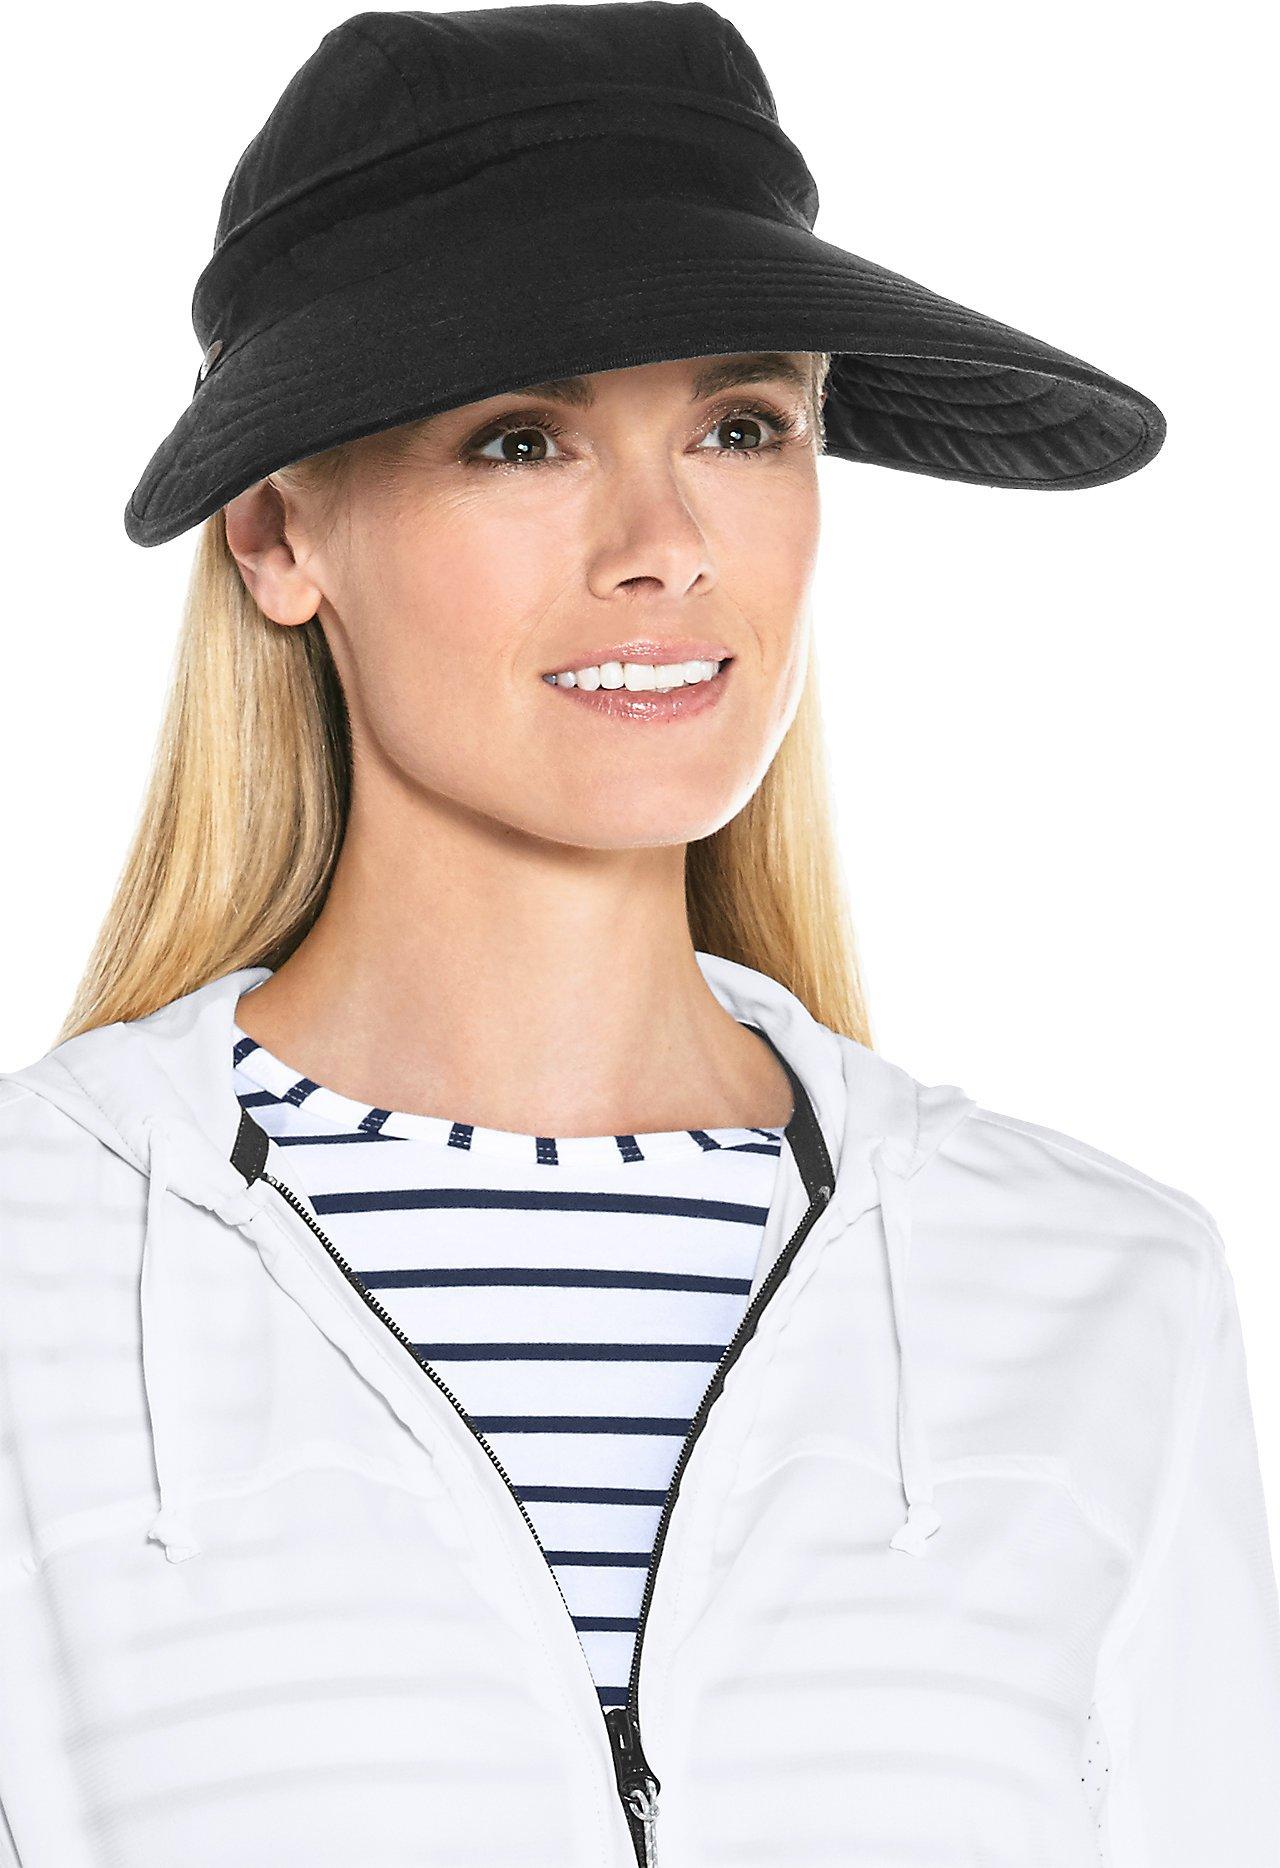 Coolibar UPF 50+ Women's Bel Aire Zip-Off Sun Visor - Sun Protective (One Size- Black)